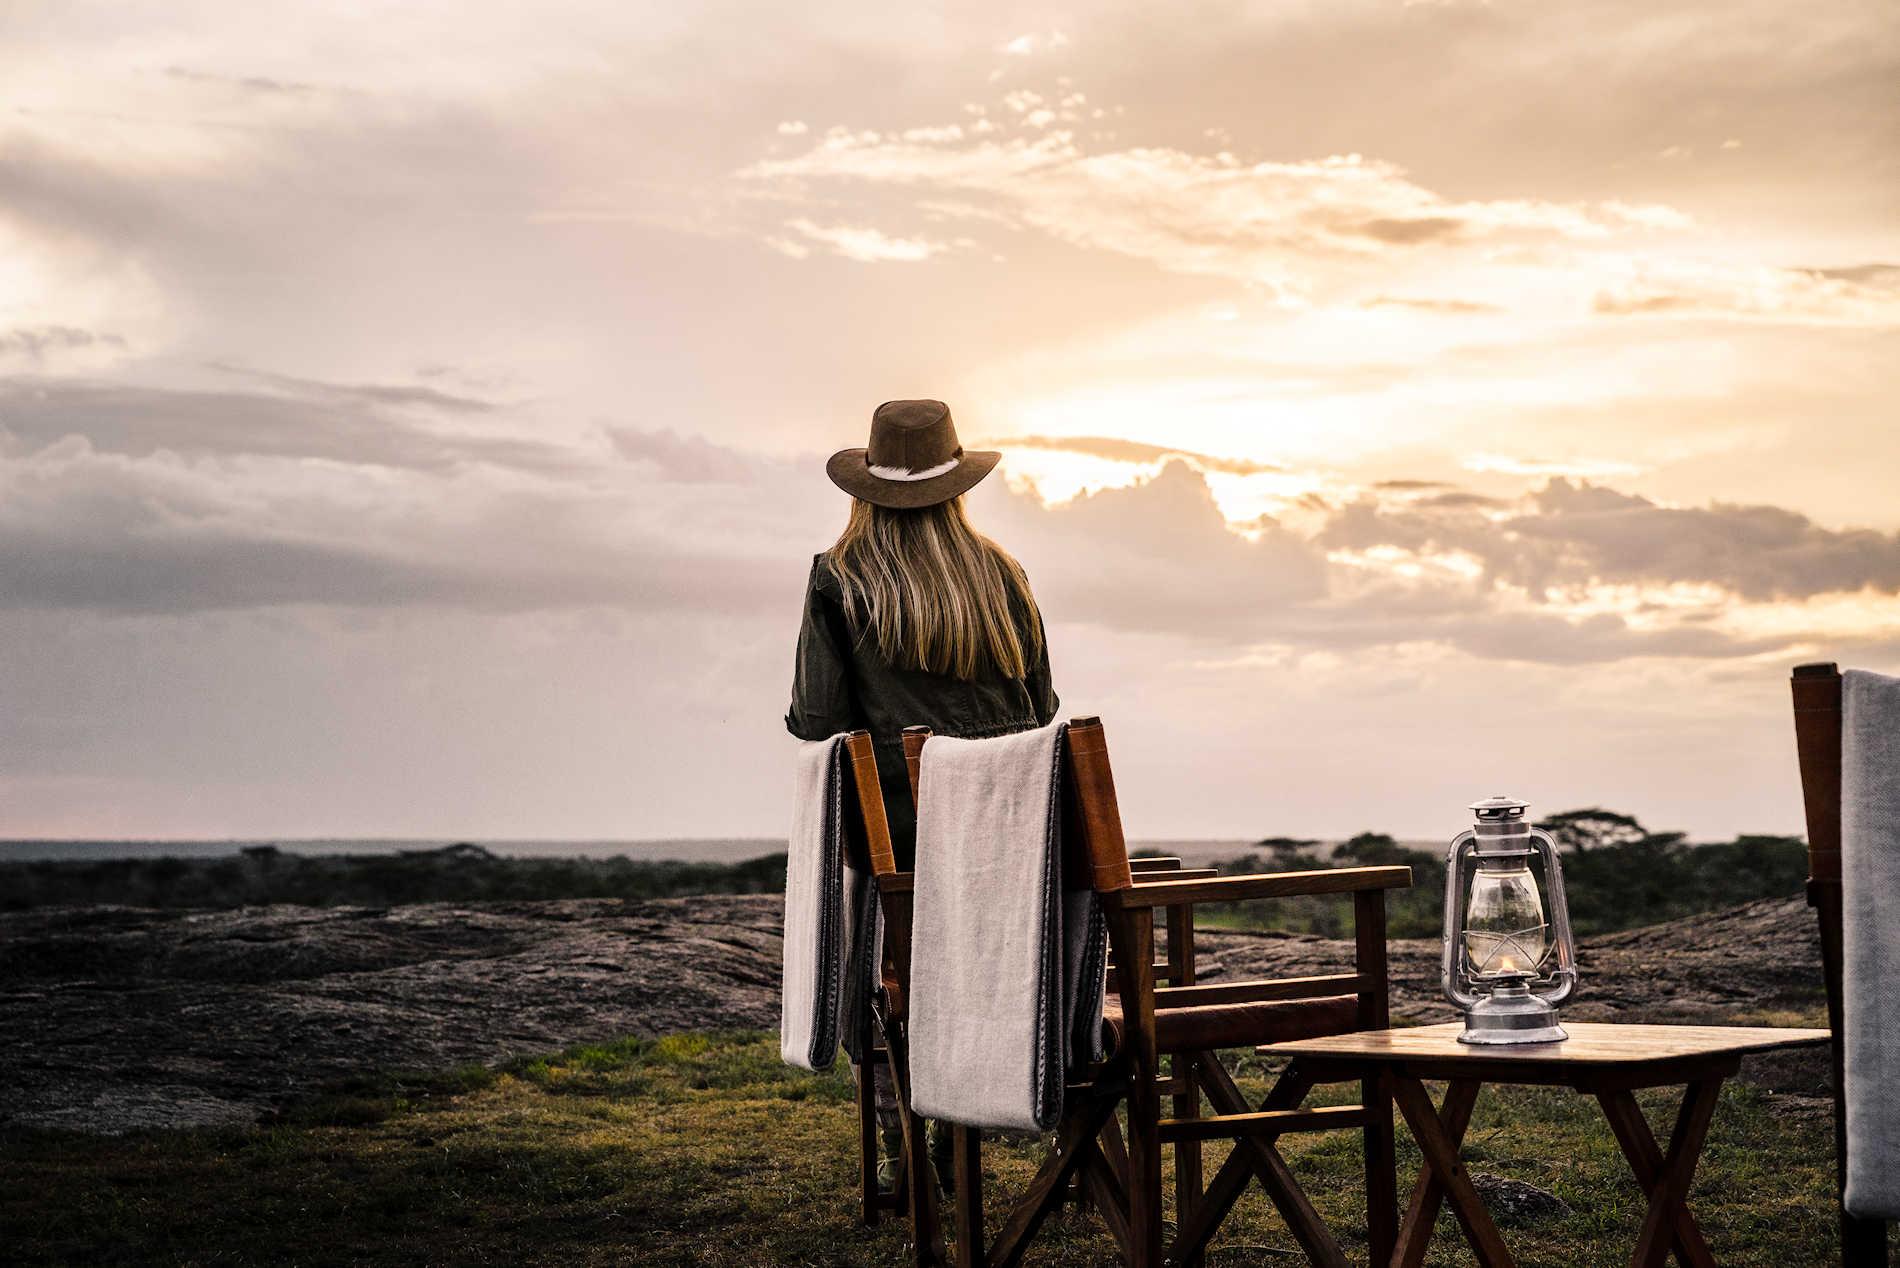 Tolle Aussicht, Sanctuary Kichakani Serengeti Camp, Tansania